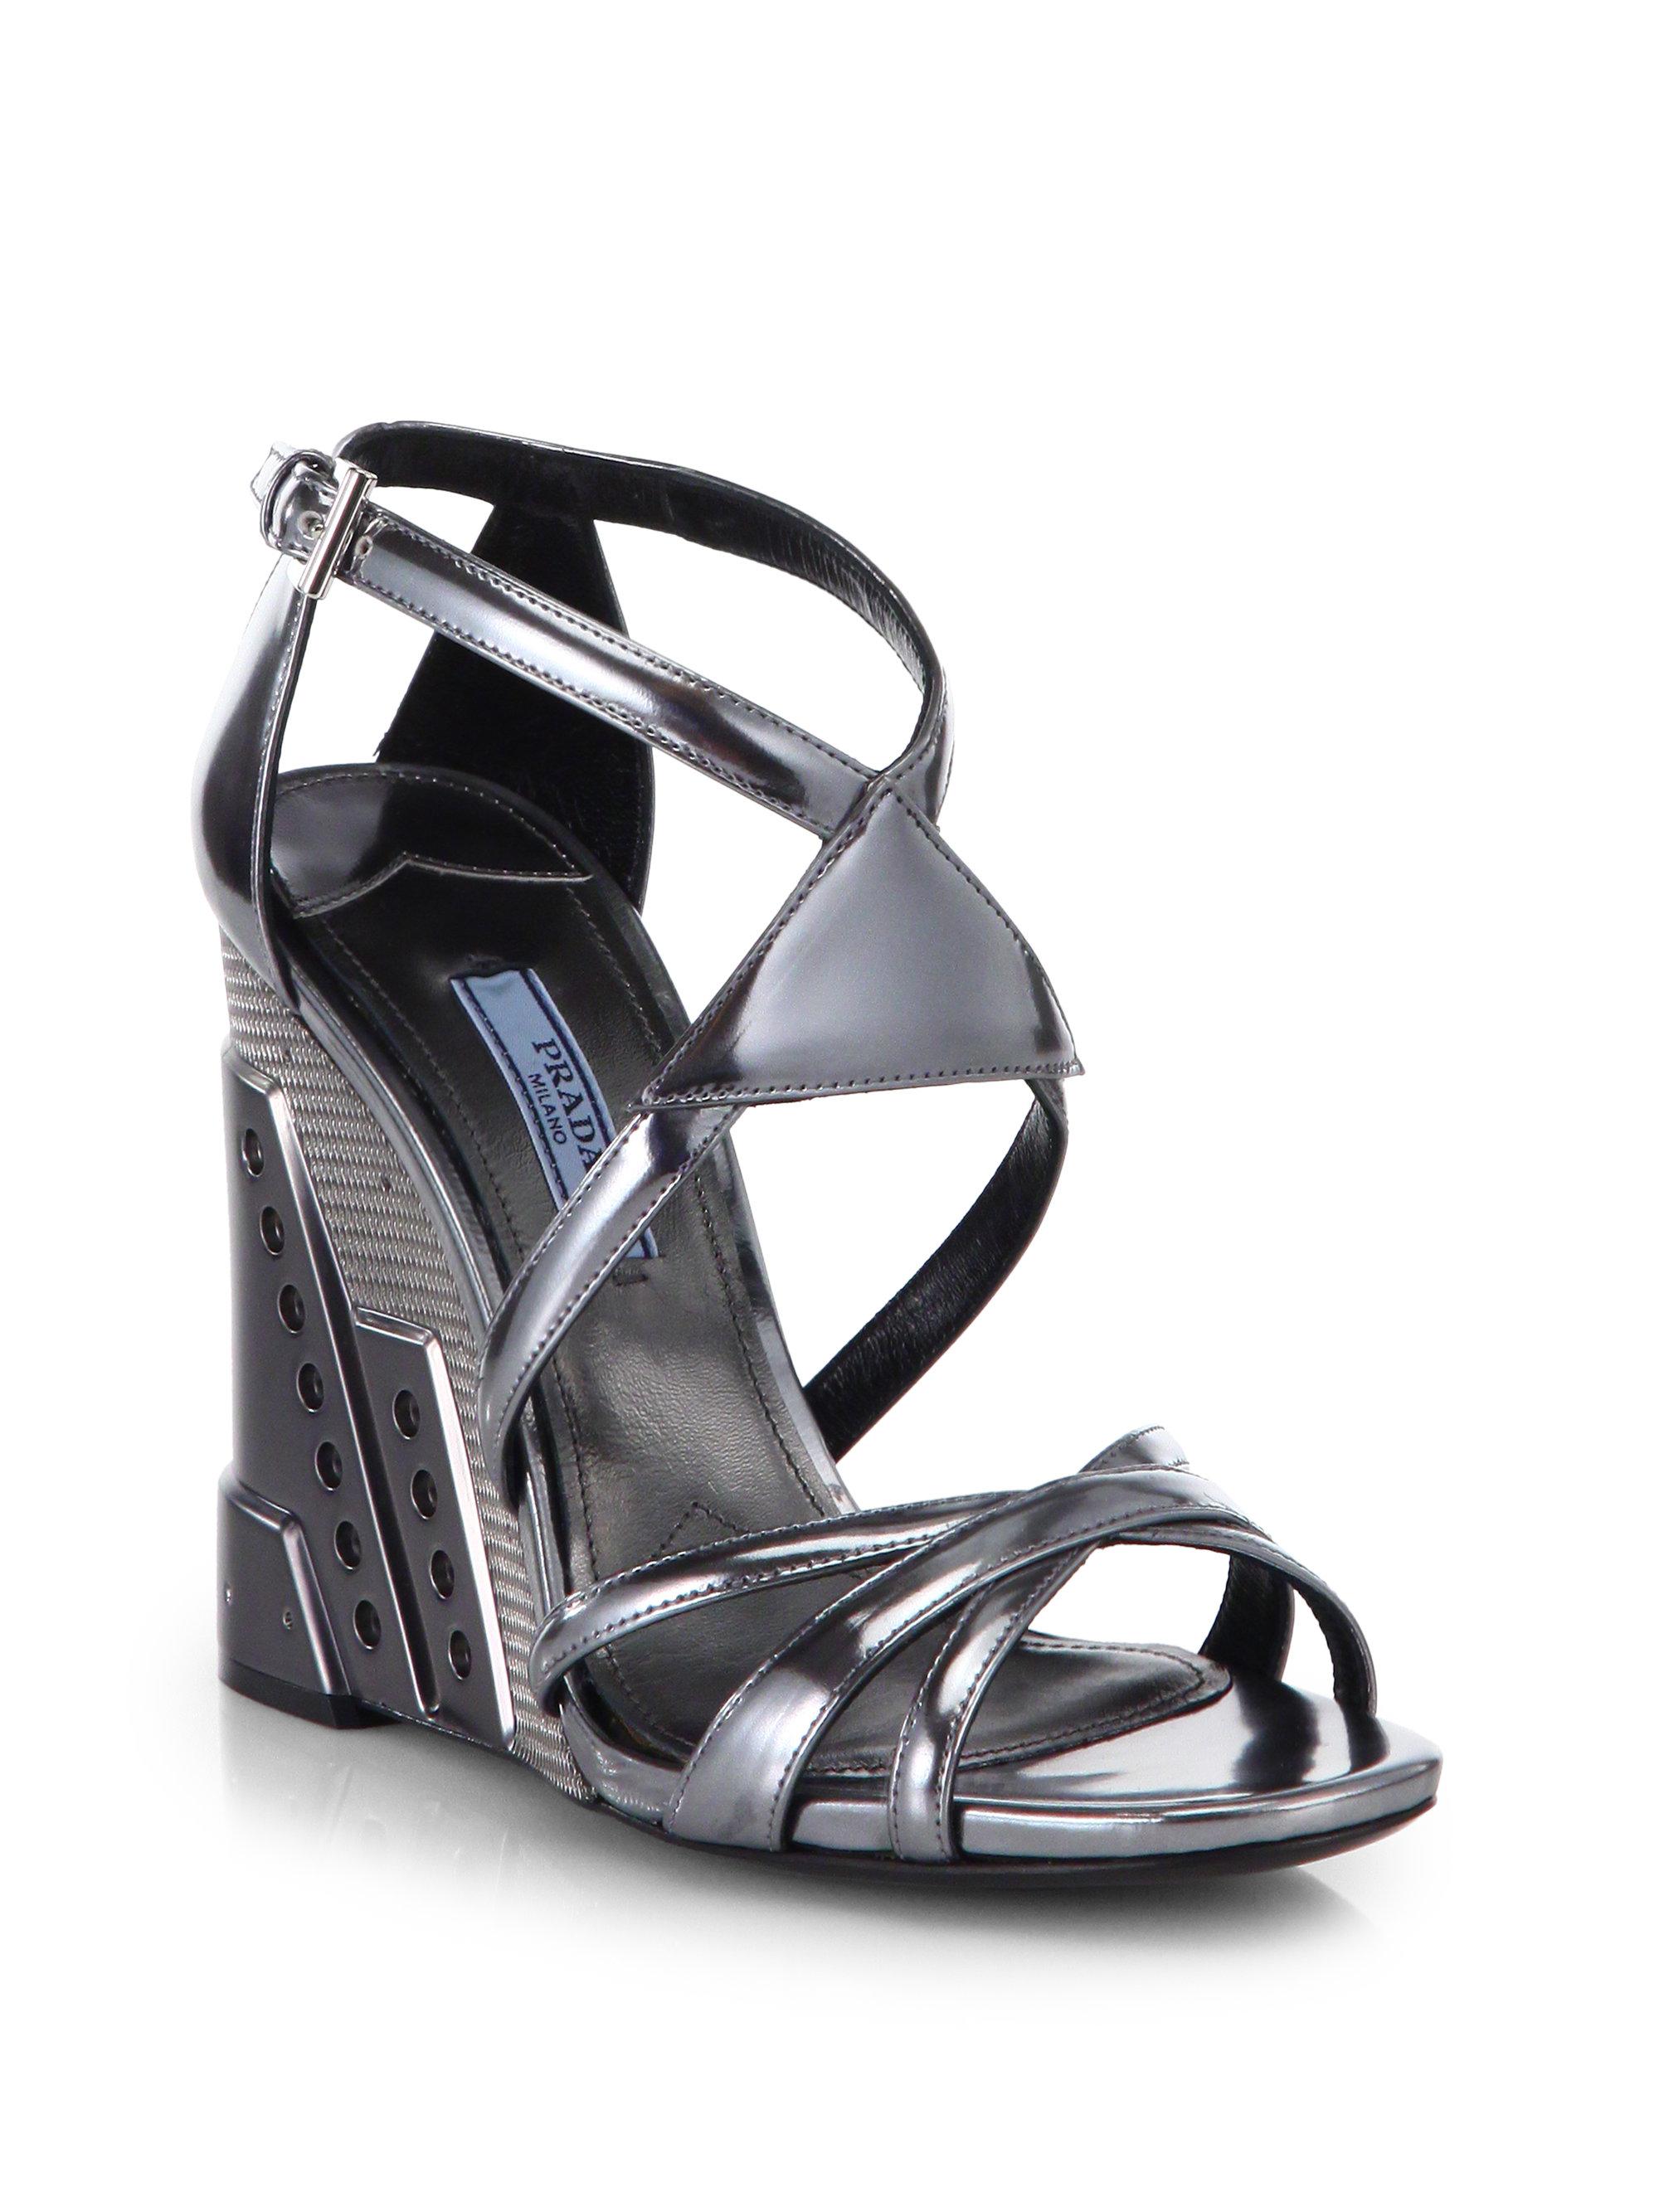 b570c1c14787 Lyst - Prada Metallic Leather Perforated Wedge Sandals in Gray